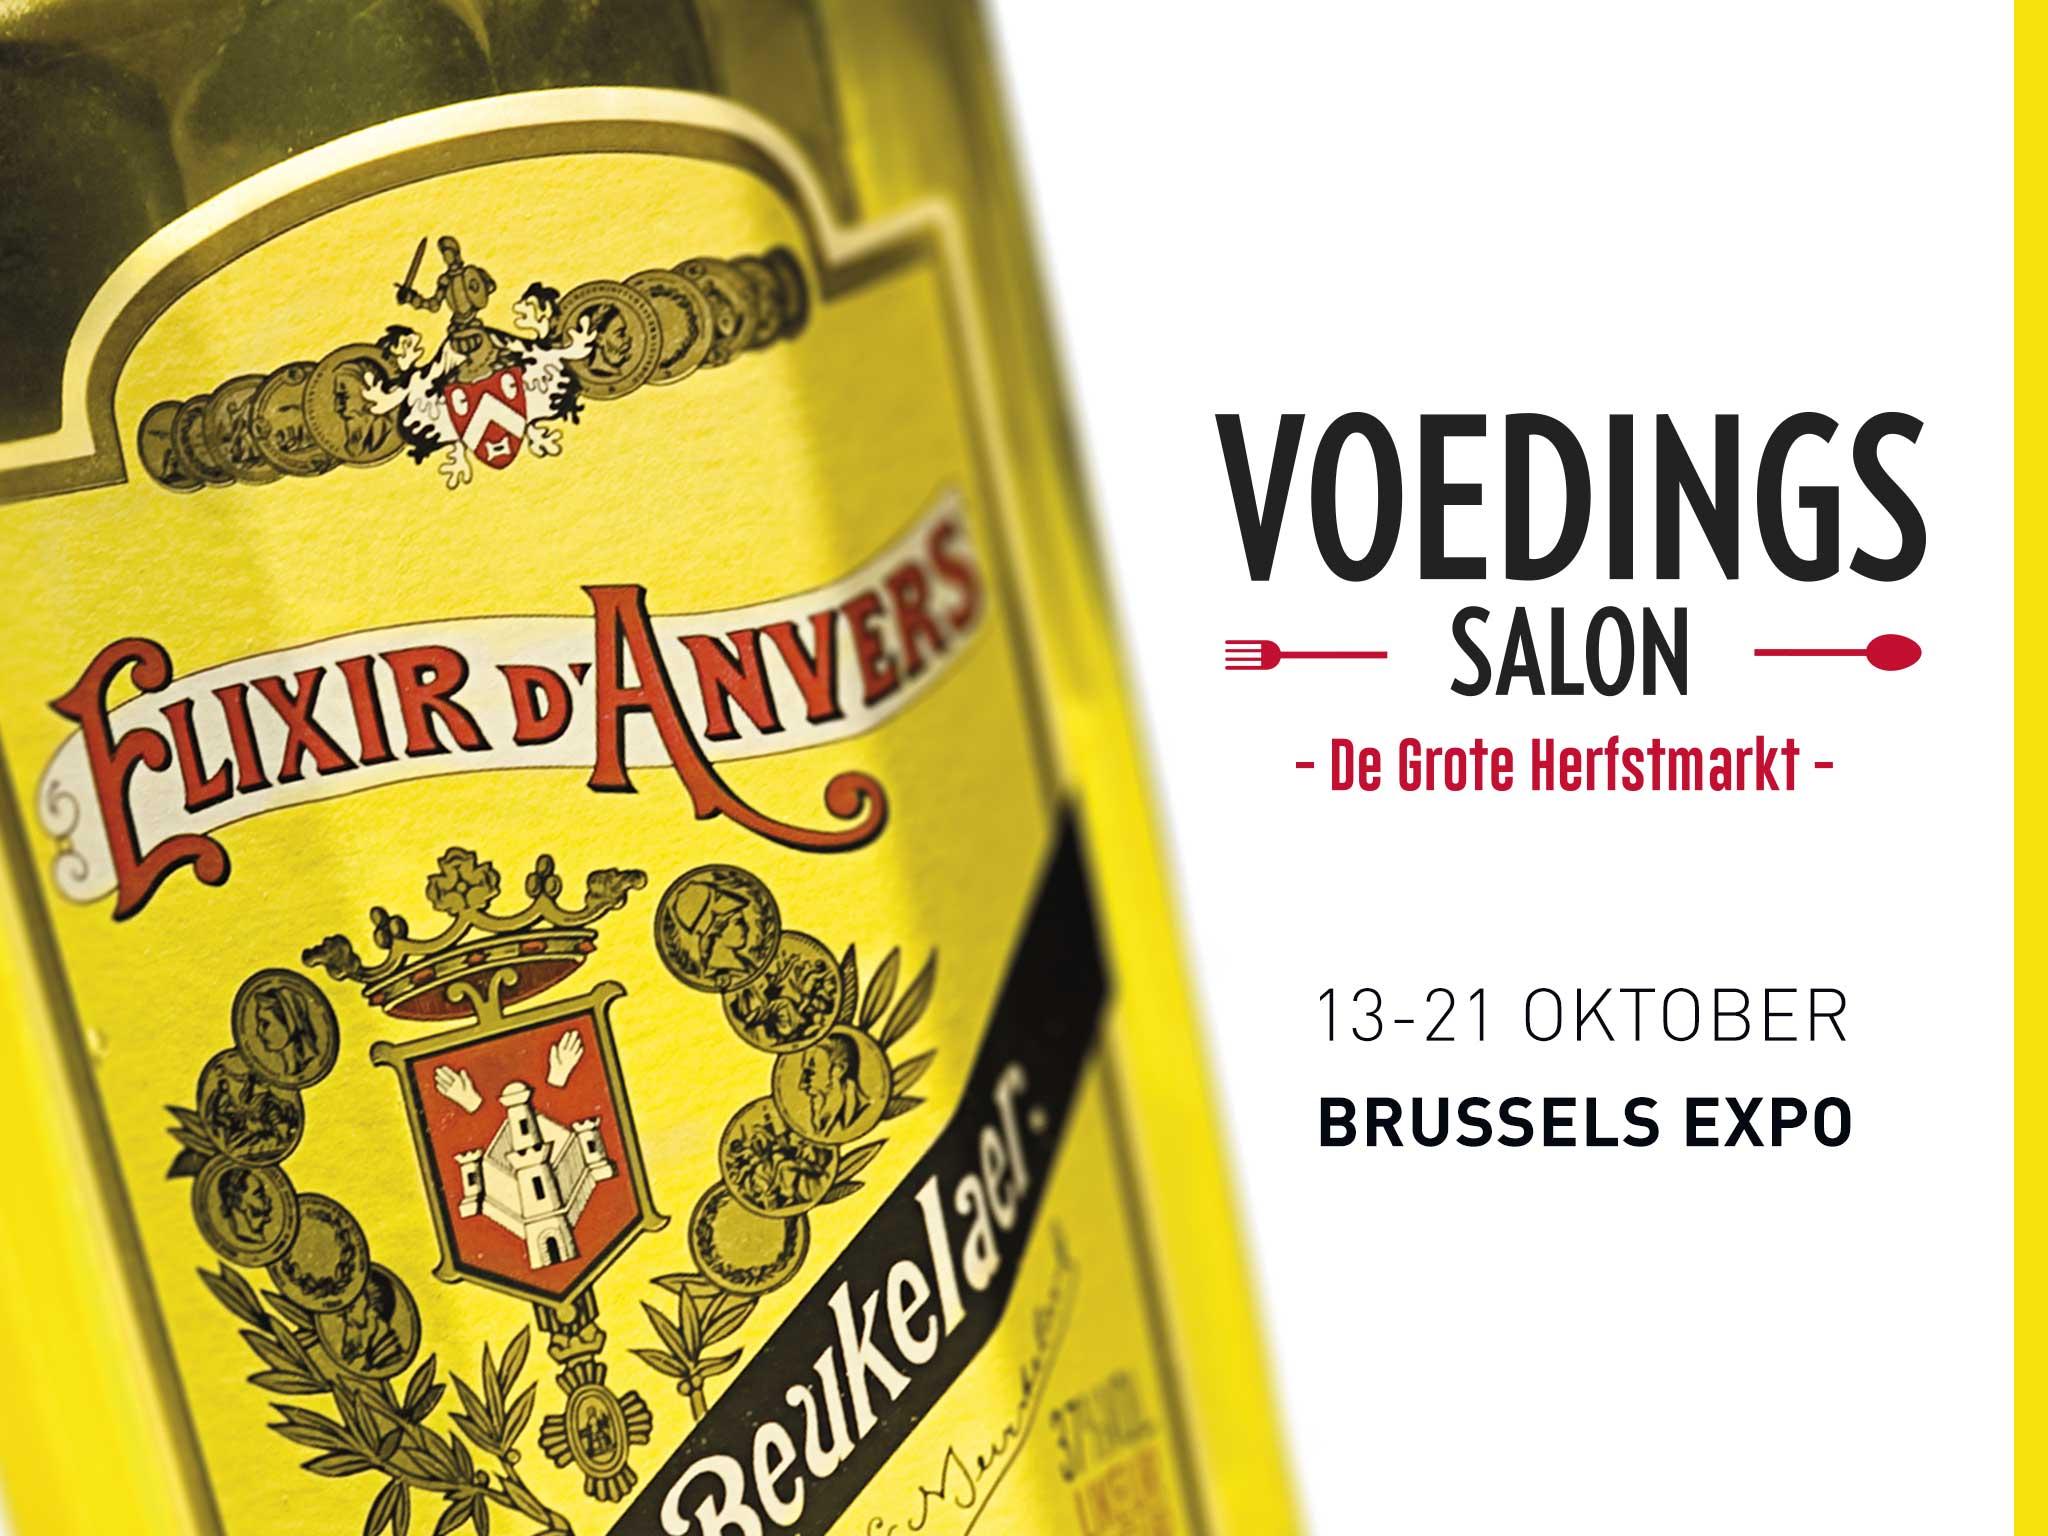 Elixir d'Anvers @ Voedingssalon 2018